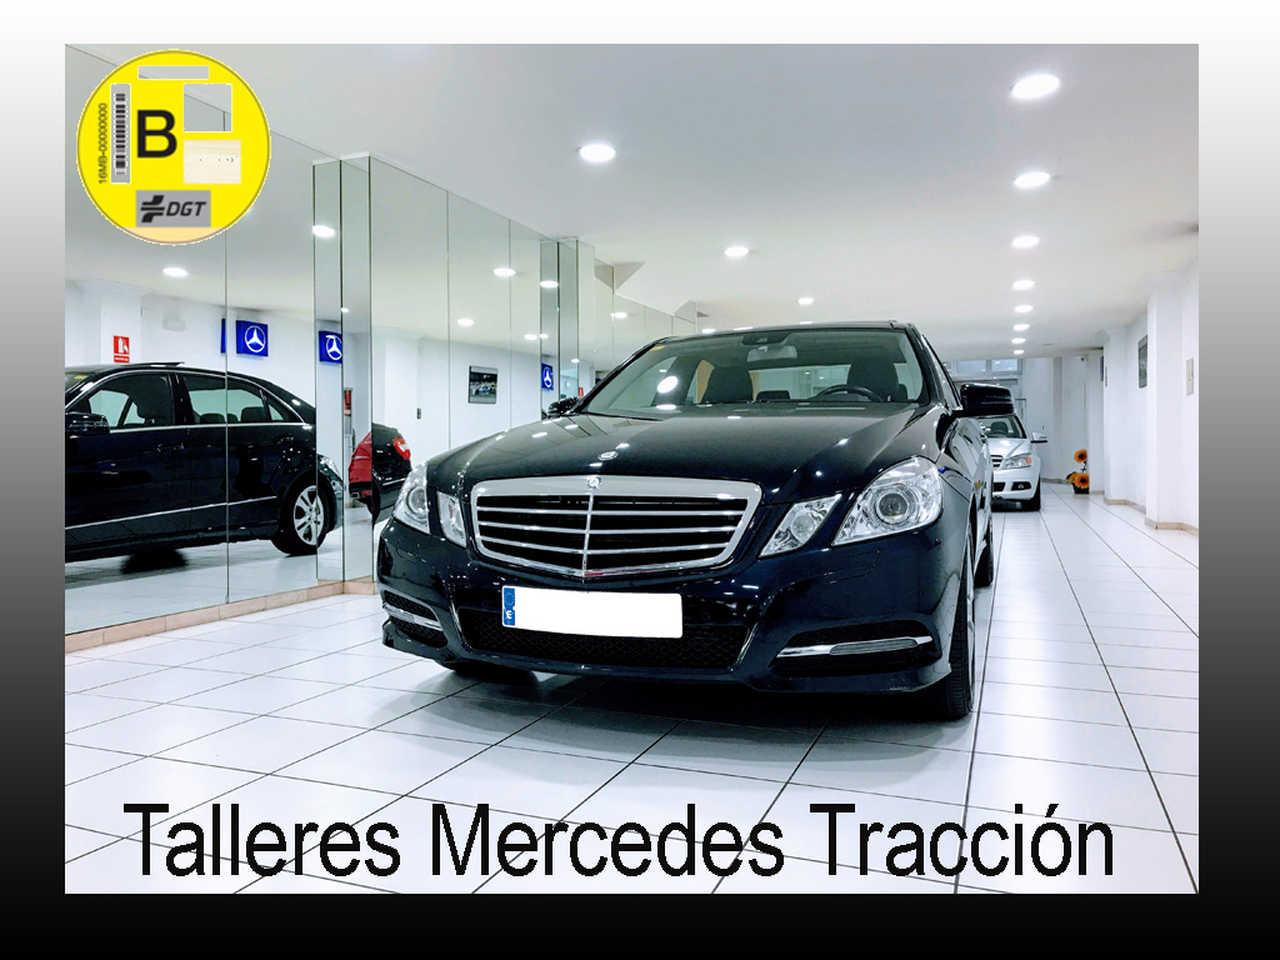 Mercedes Clase E 200 CDI/Avantgarde/7G Plus/ILS/Techo Panoramico   - Foto 1